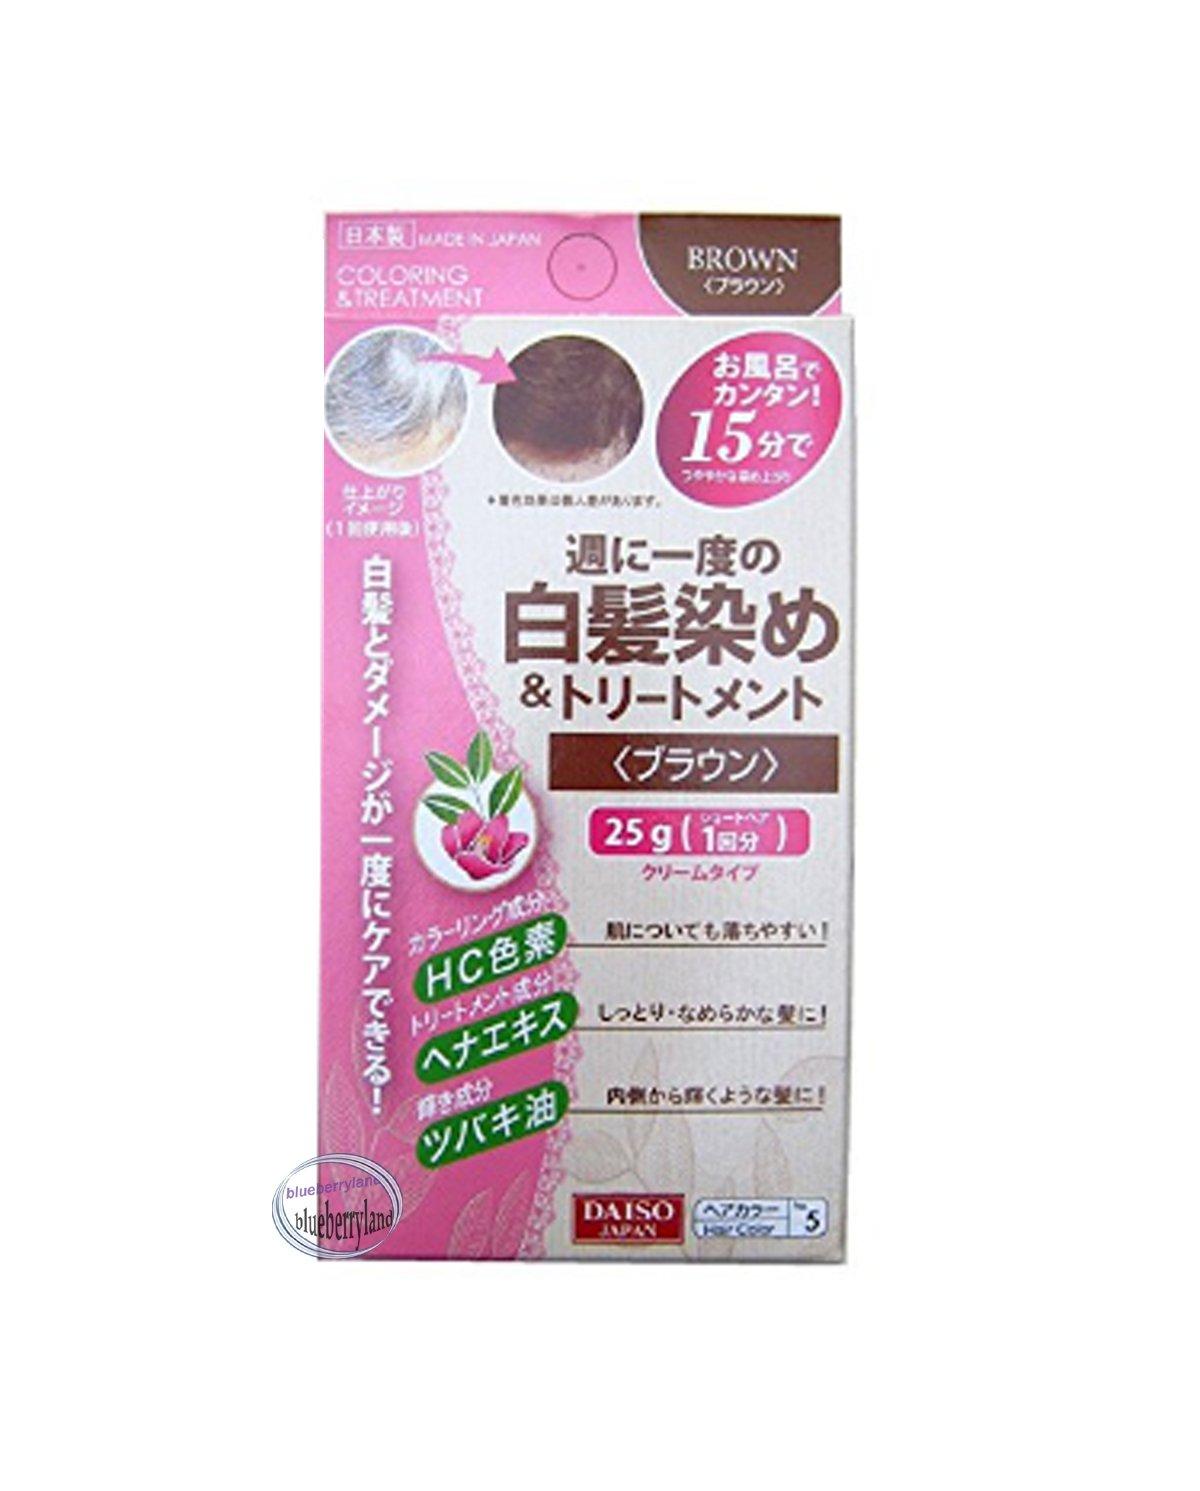 Japan Hair Coloring & Treatment 25g Brown